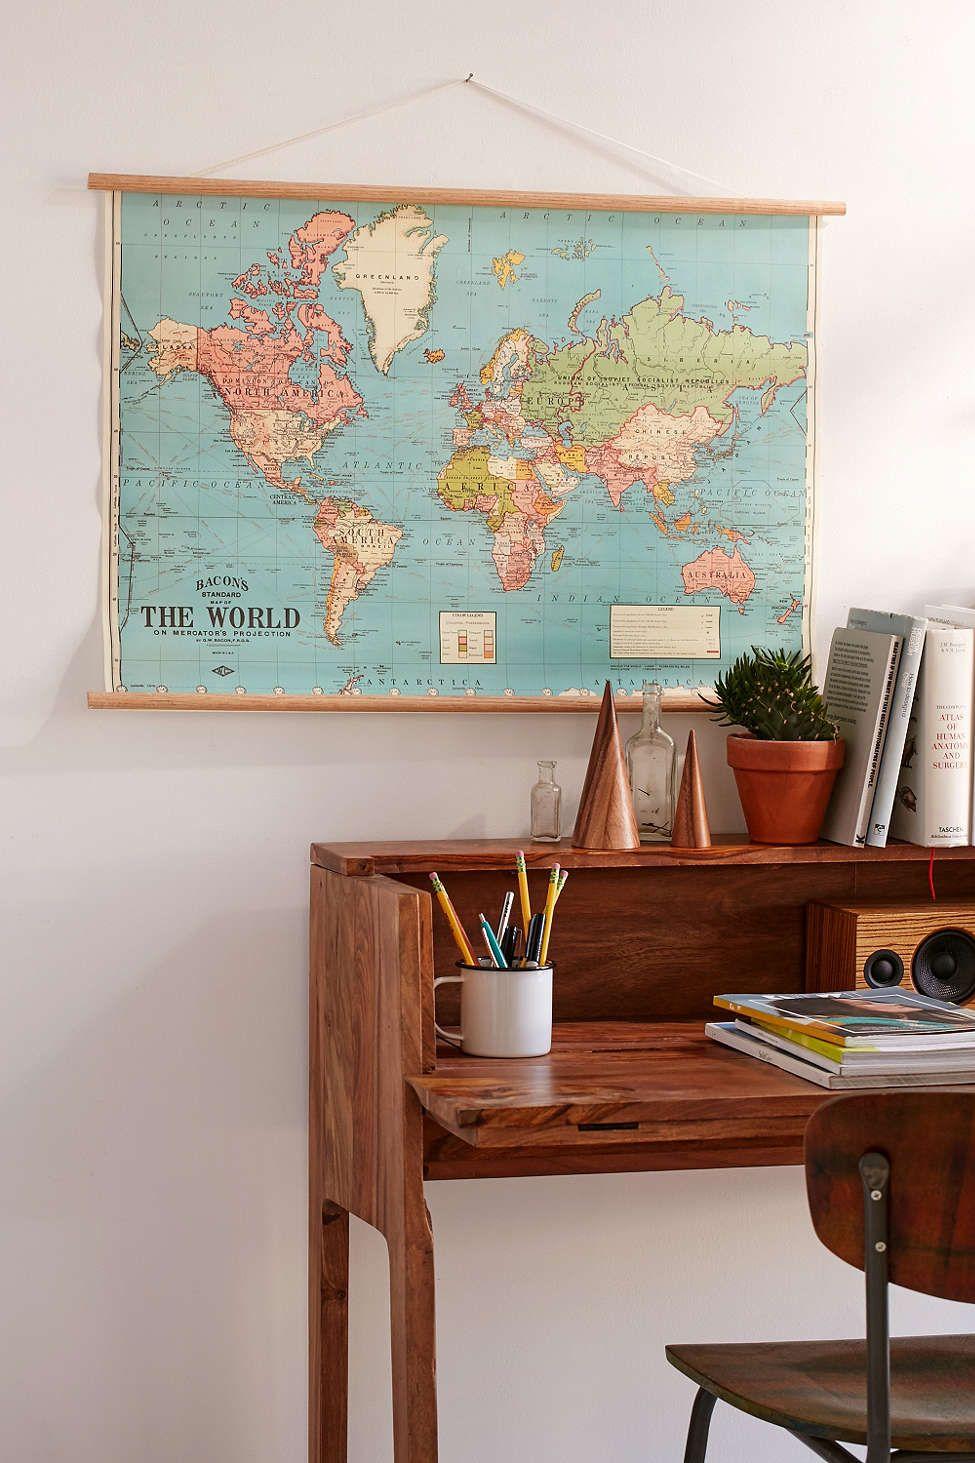 Wooden print dowel hanger in 2018 dream bedrooms pinterest boys bedroom vintage teen desk study room hanging world map art print gumiabroncs Images